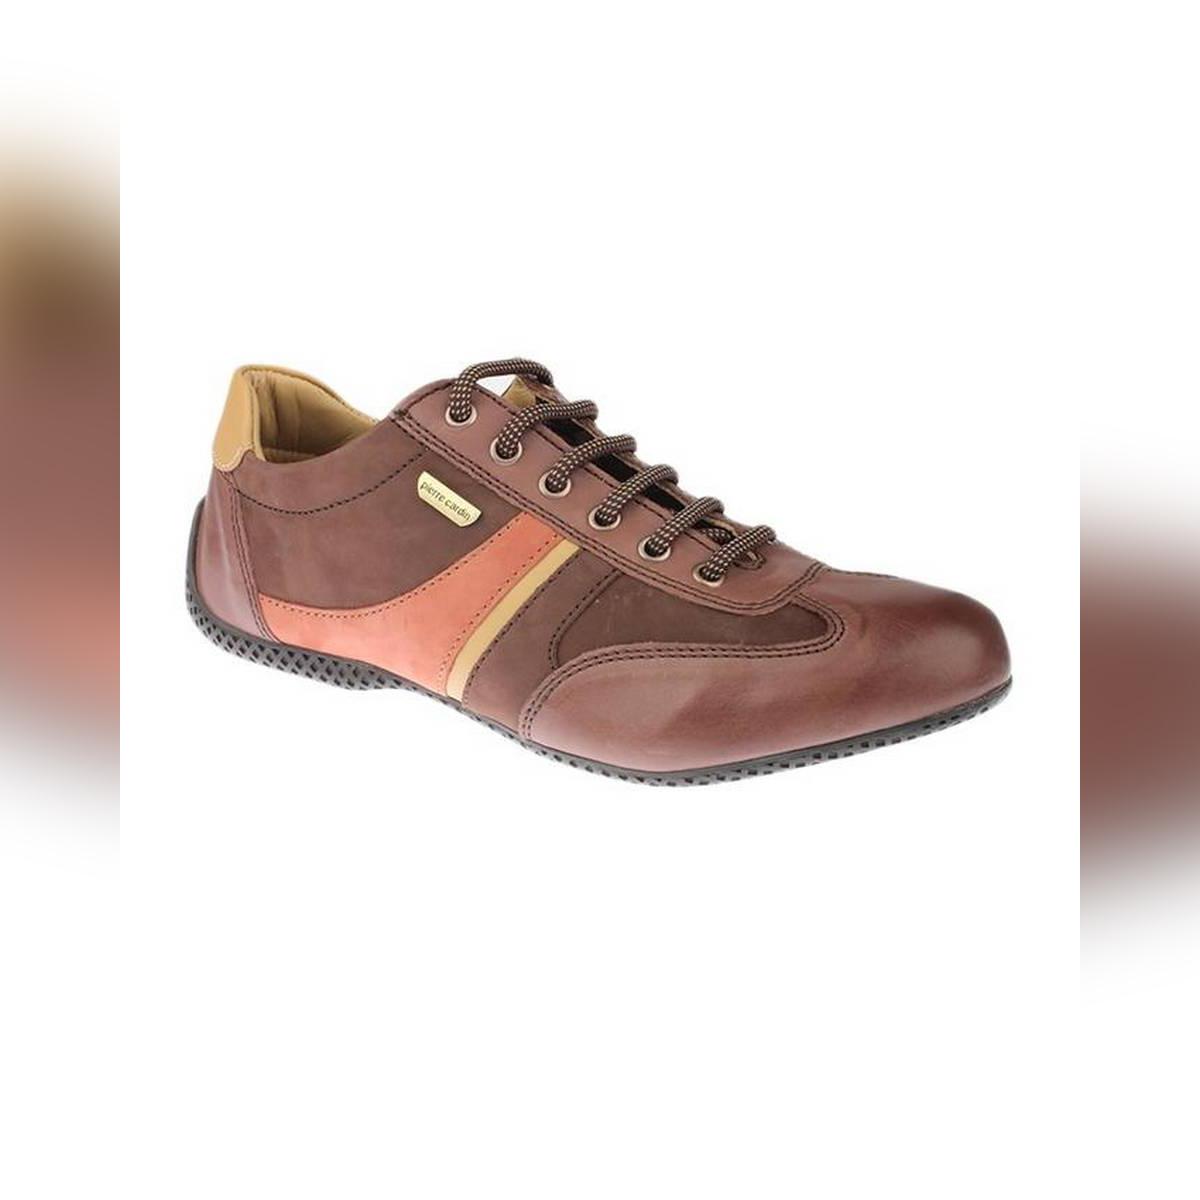 Urban Sole Sneaker Winter Collection - CB 7116